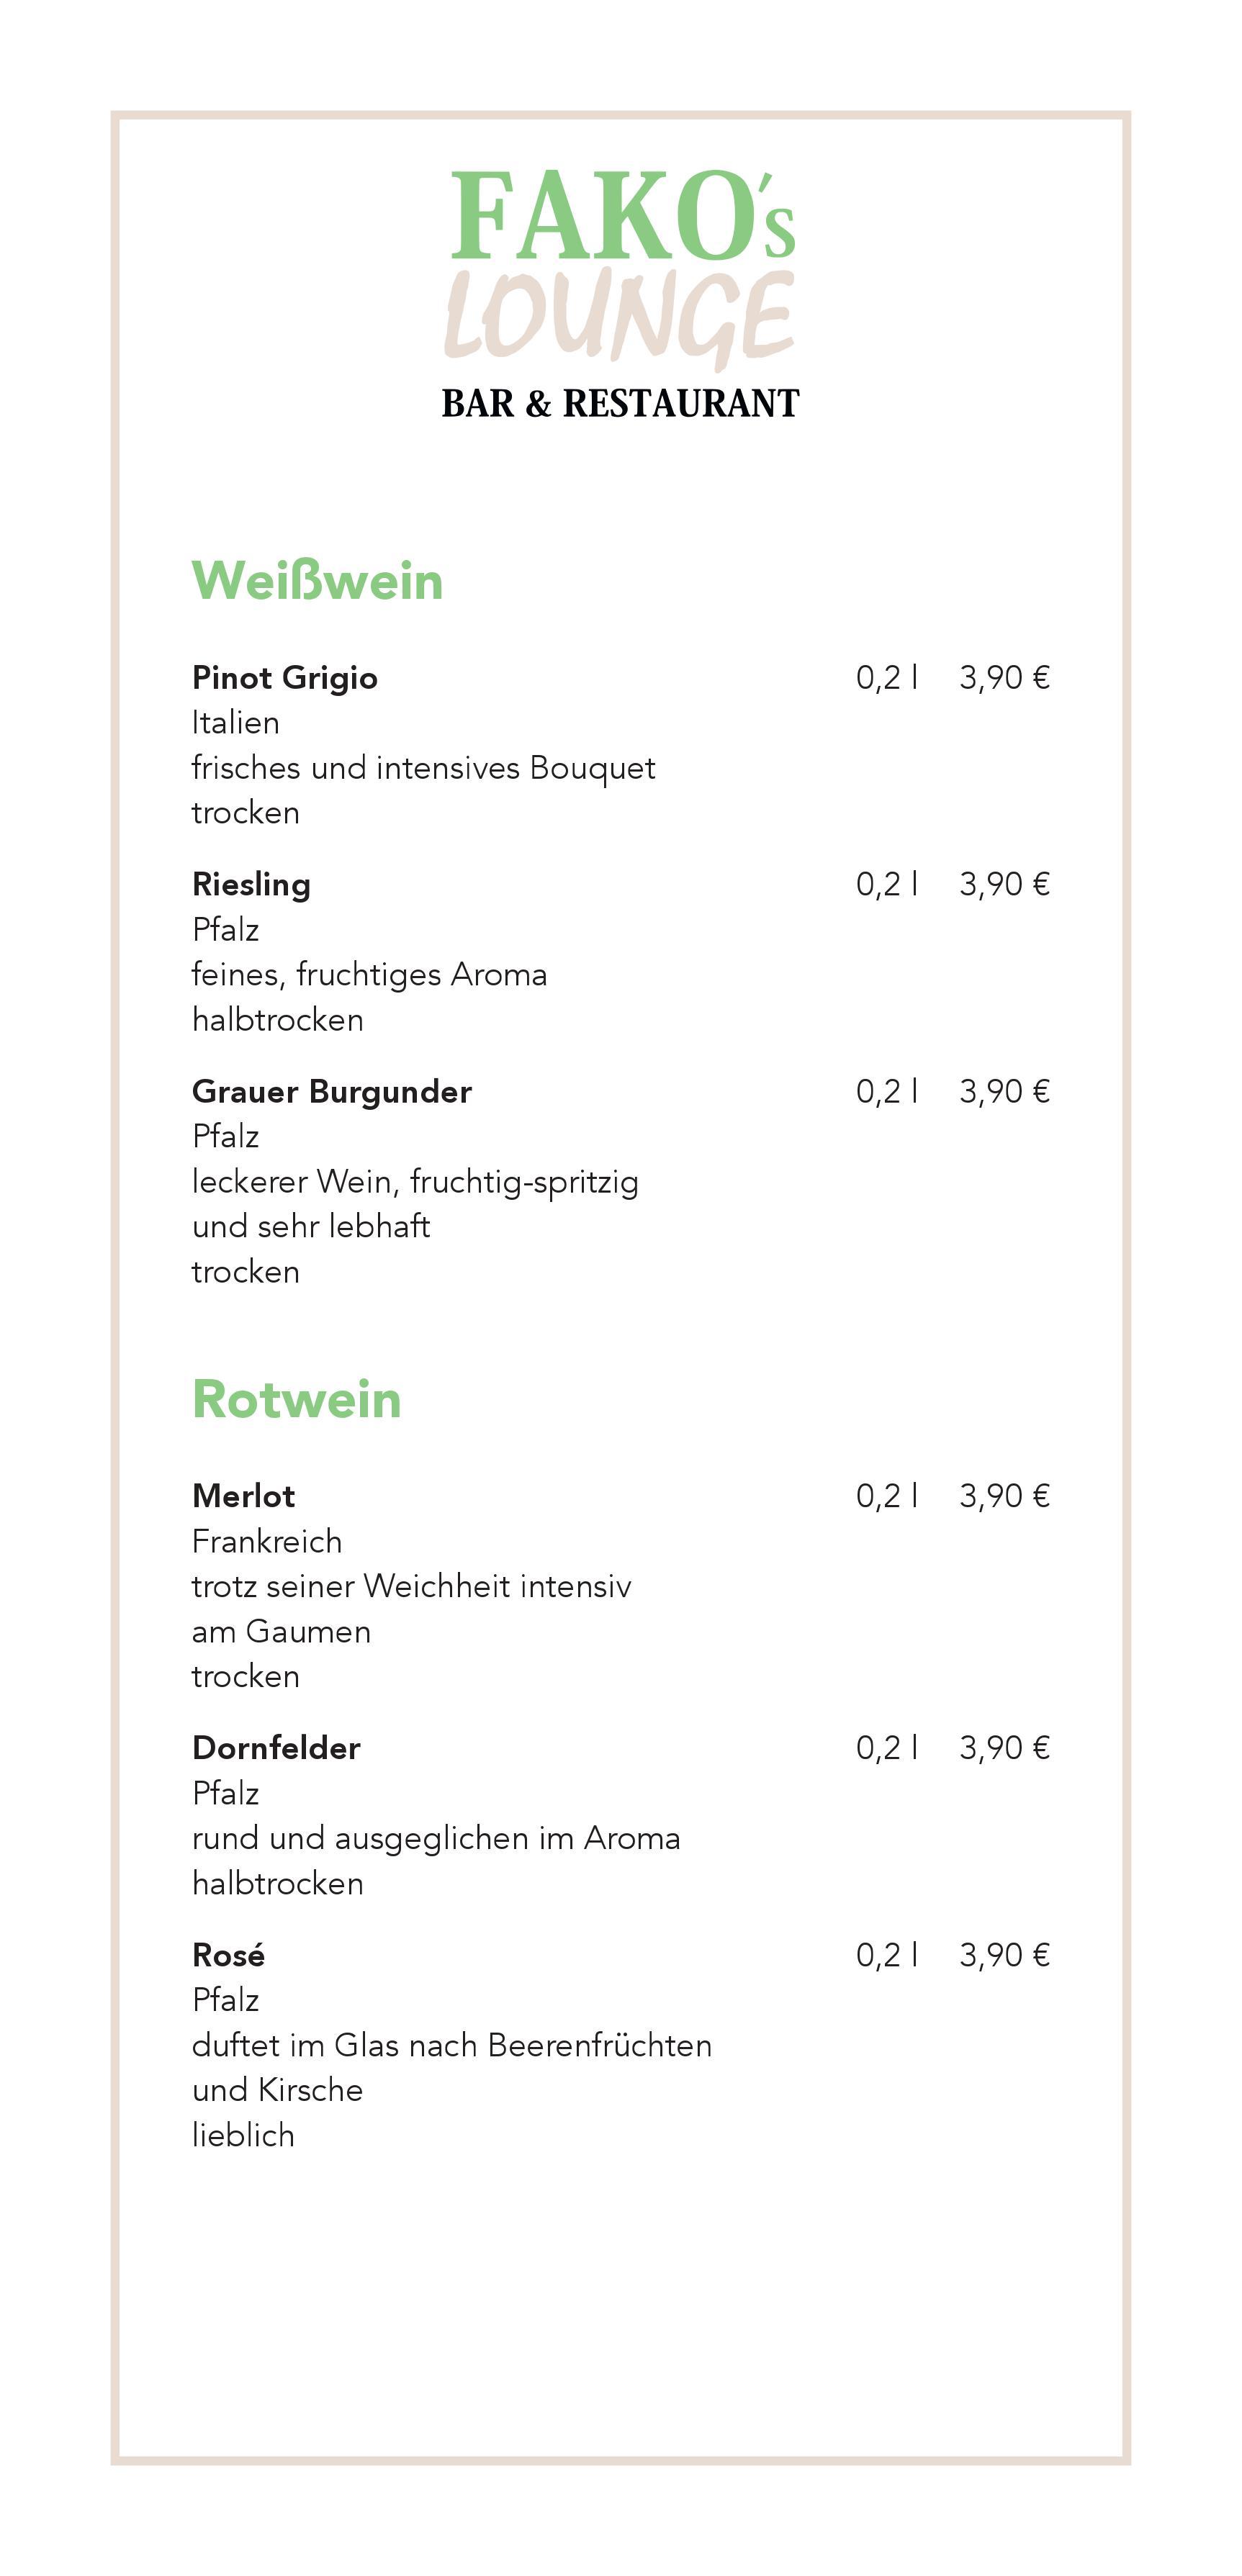 Alkoholische Getränke | Fakos Lounge